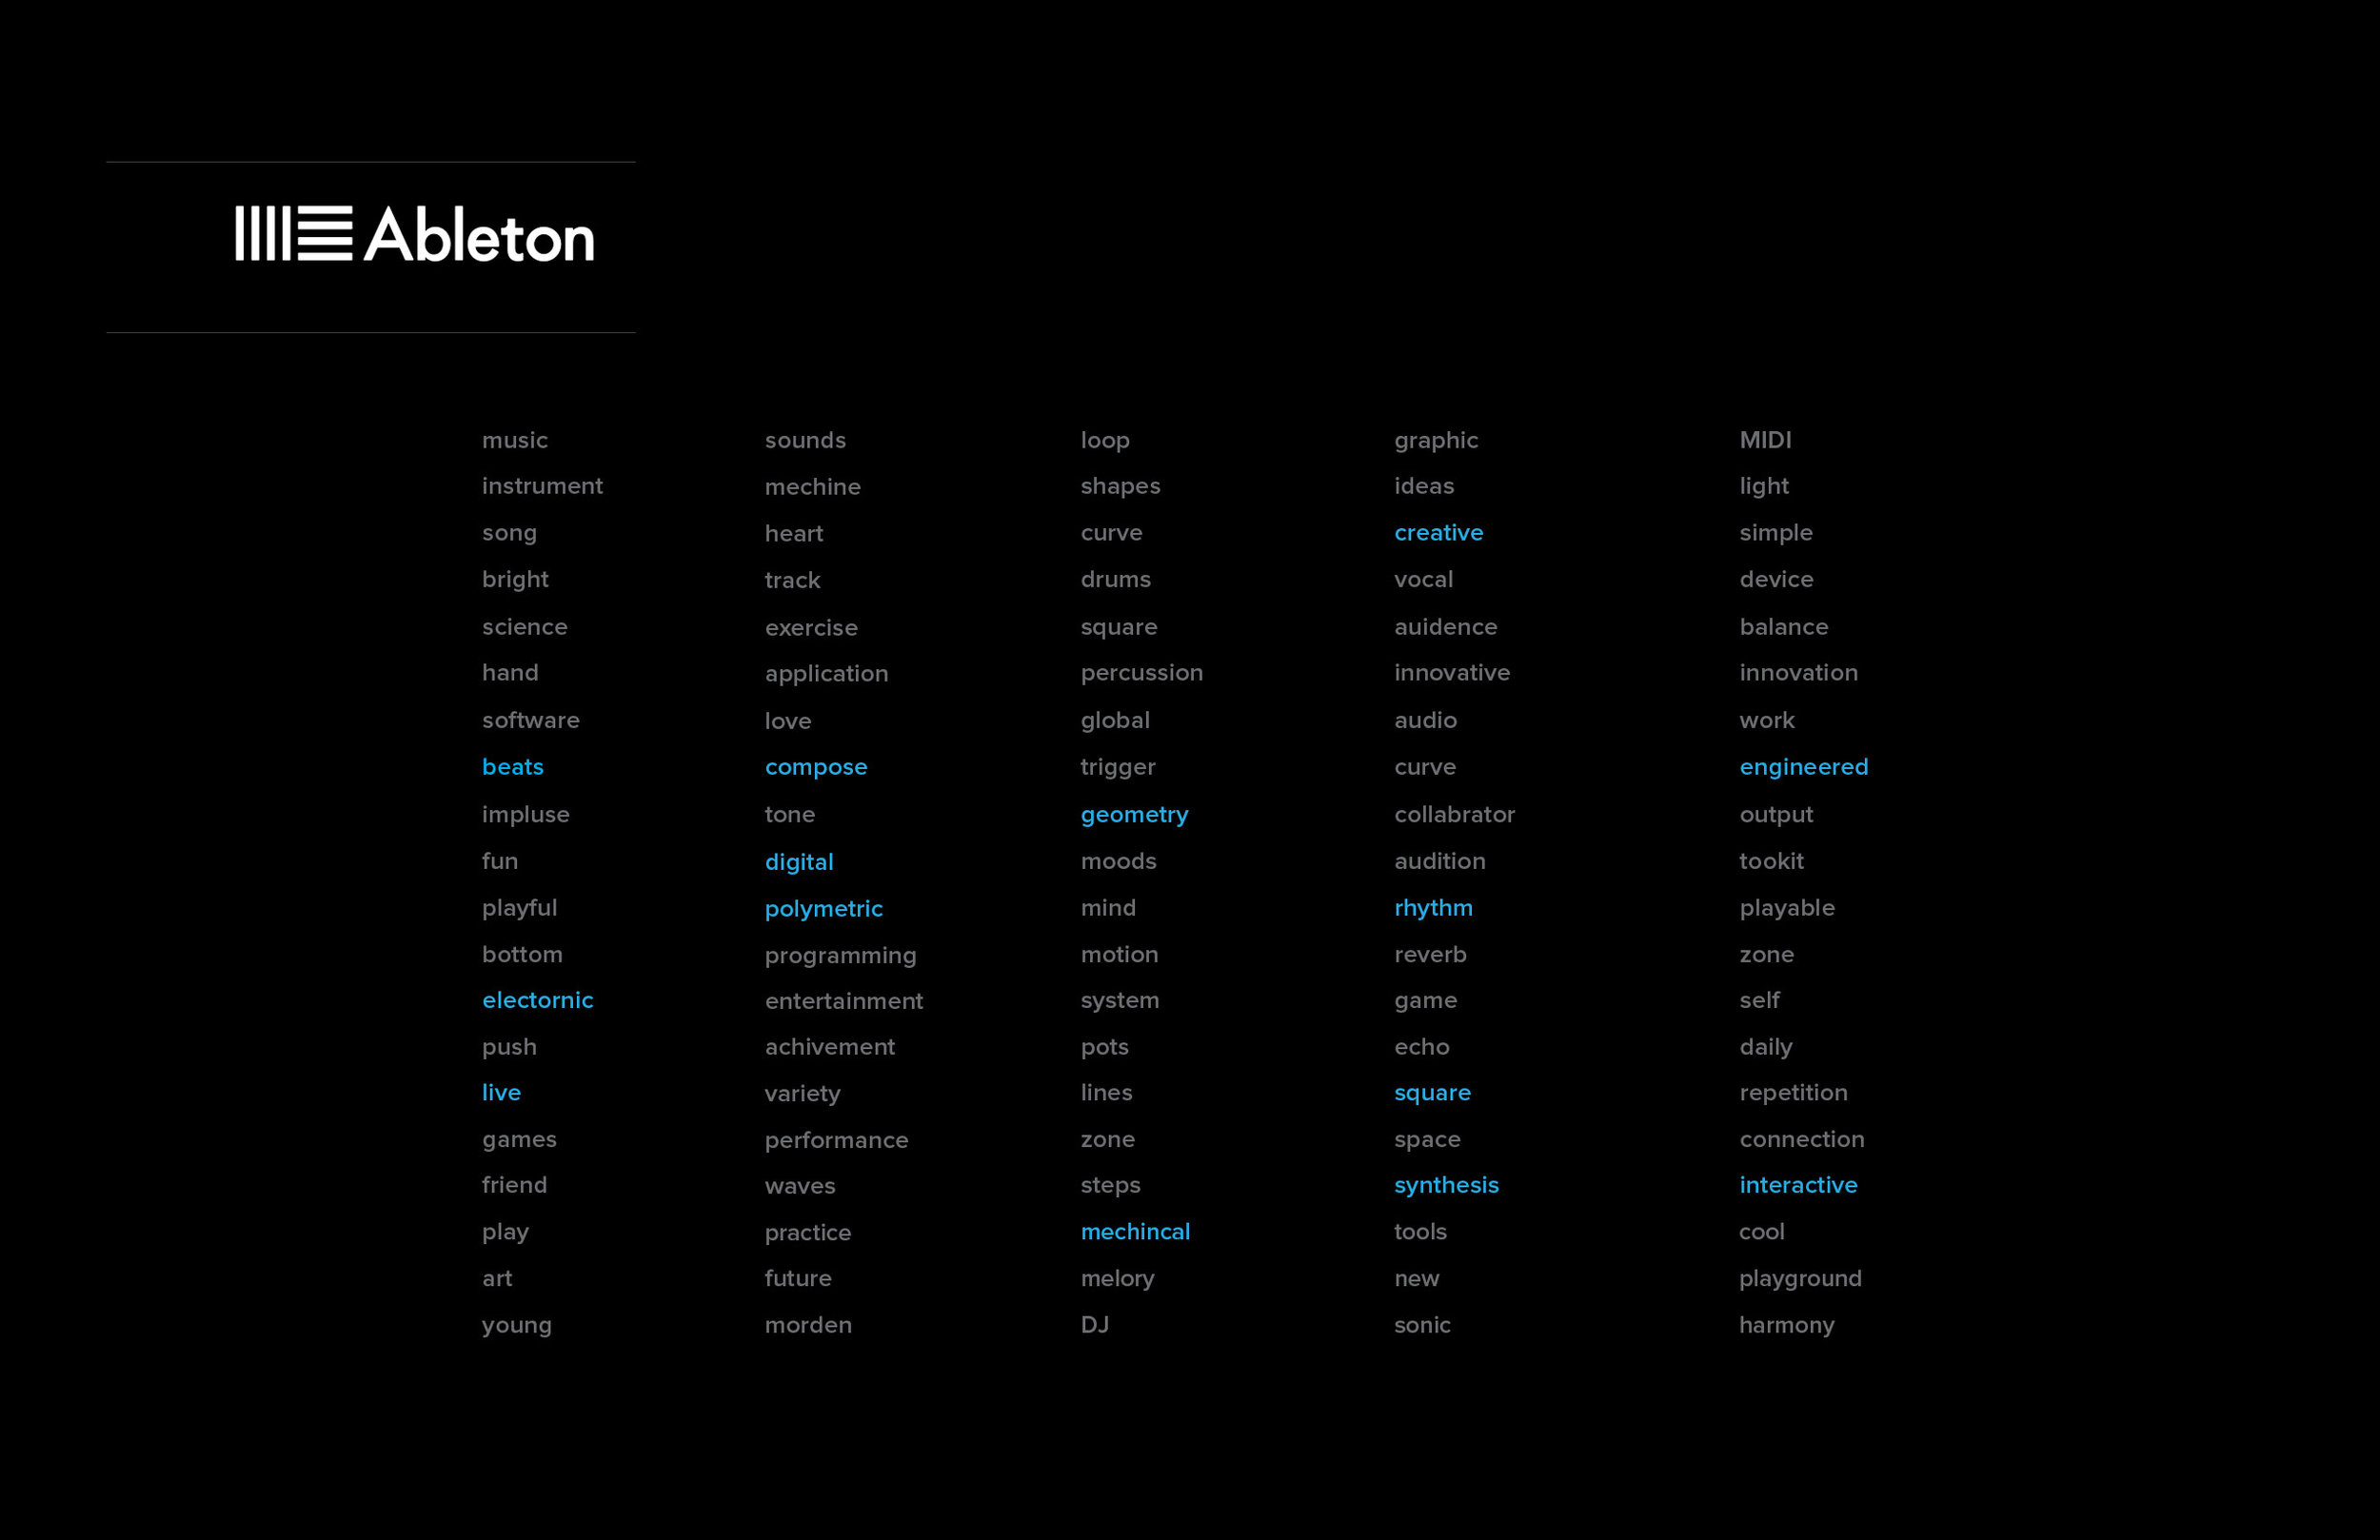 Alebton_Motion_Design_Production_Book3.jpg